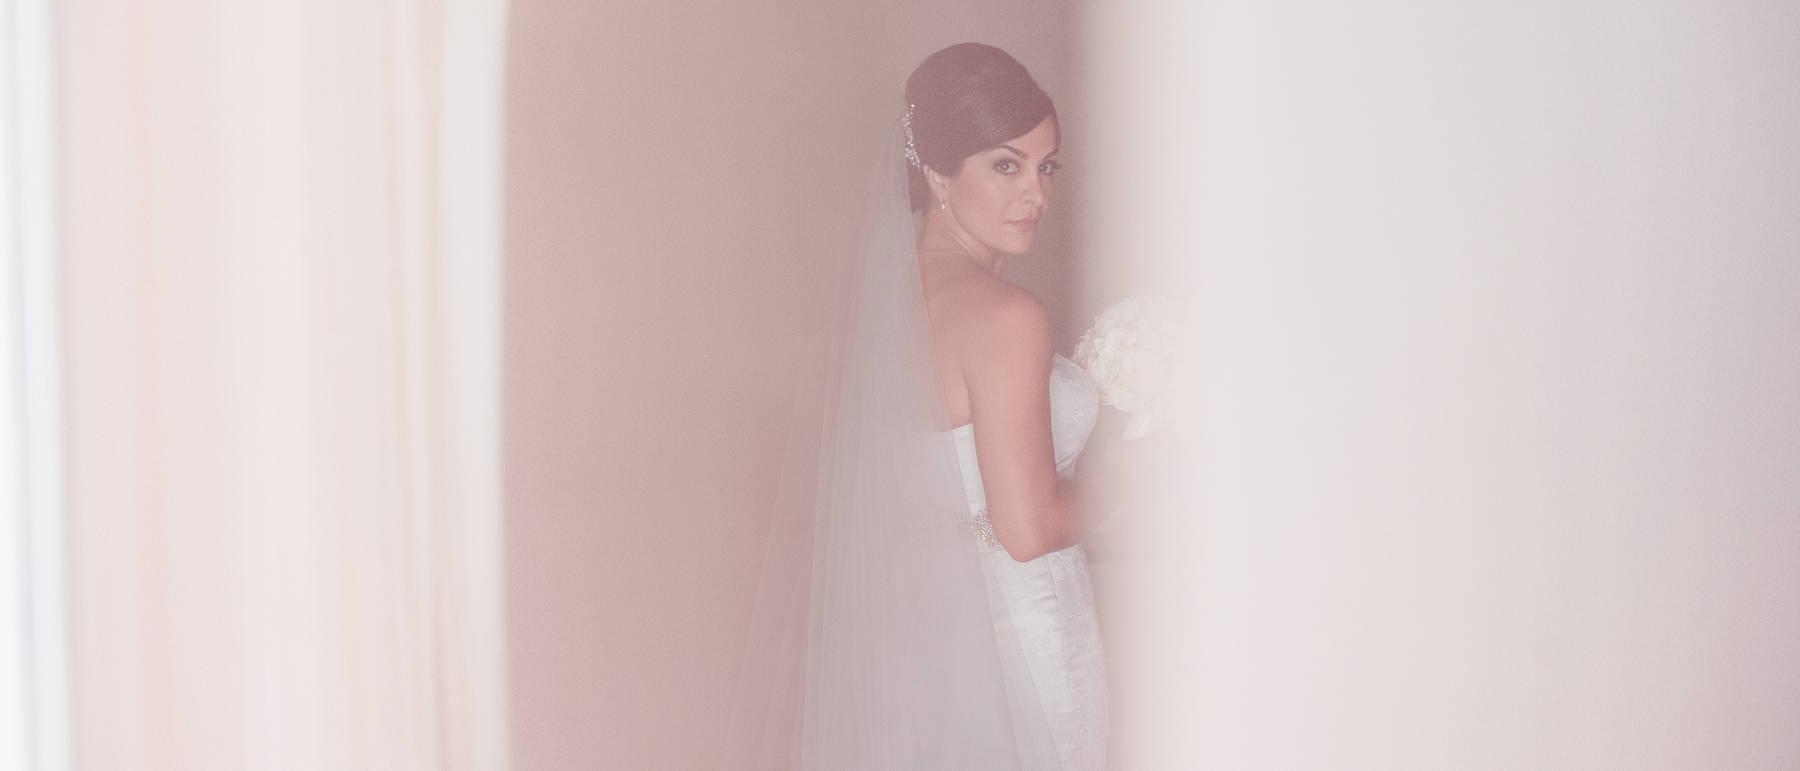 johnandjoseph-wedding-photographer-hz-slider-214